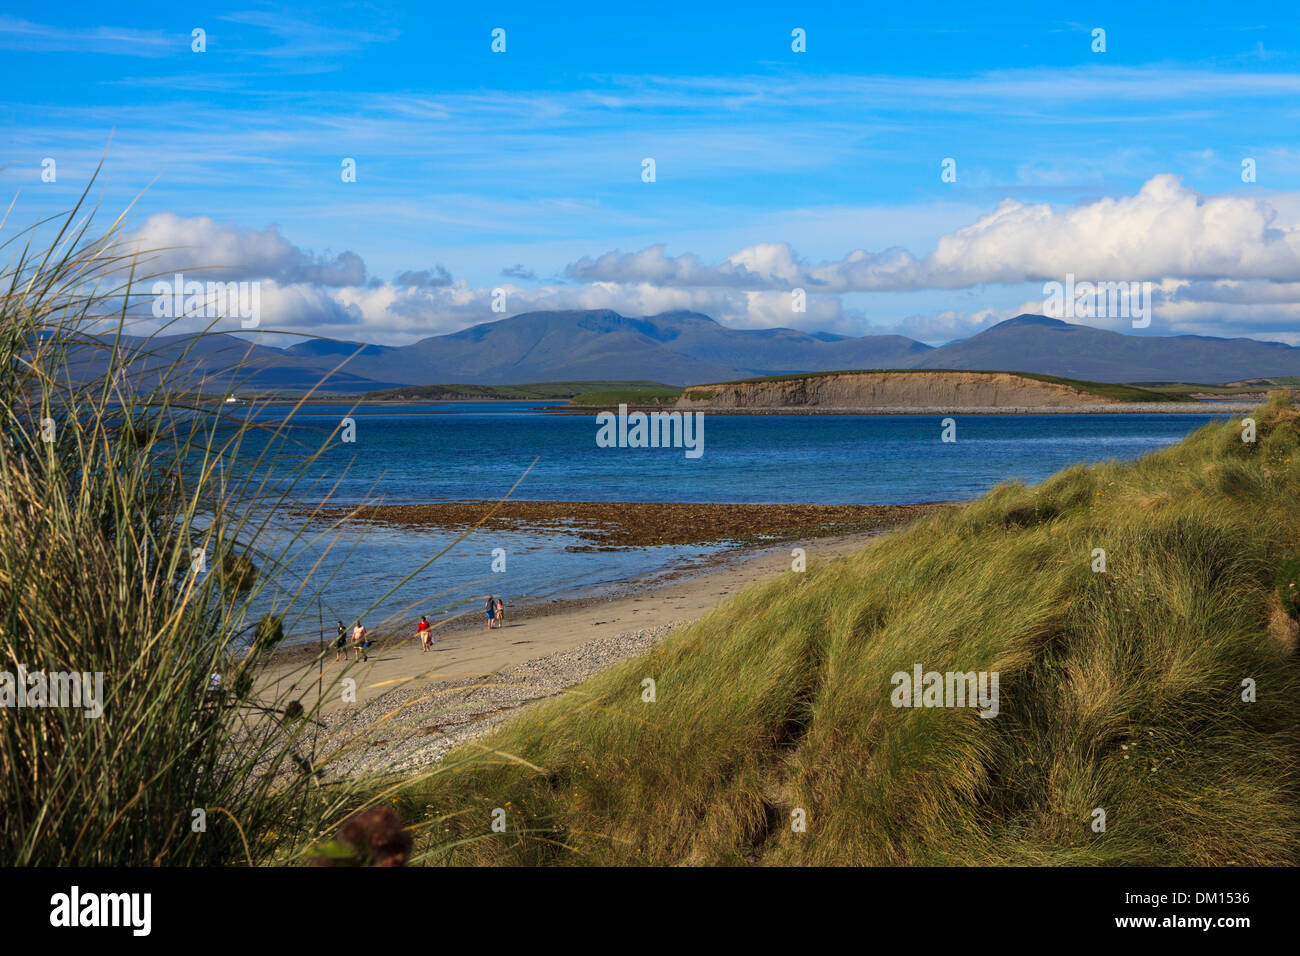 Top Beaches in County Mayo, Ireland - TripAdvisor